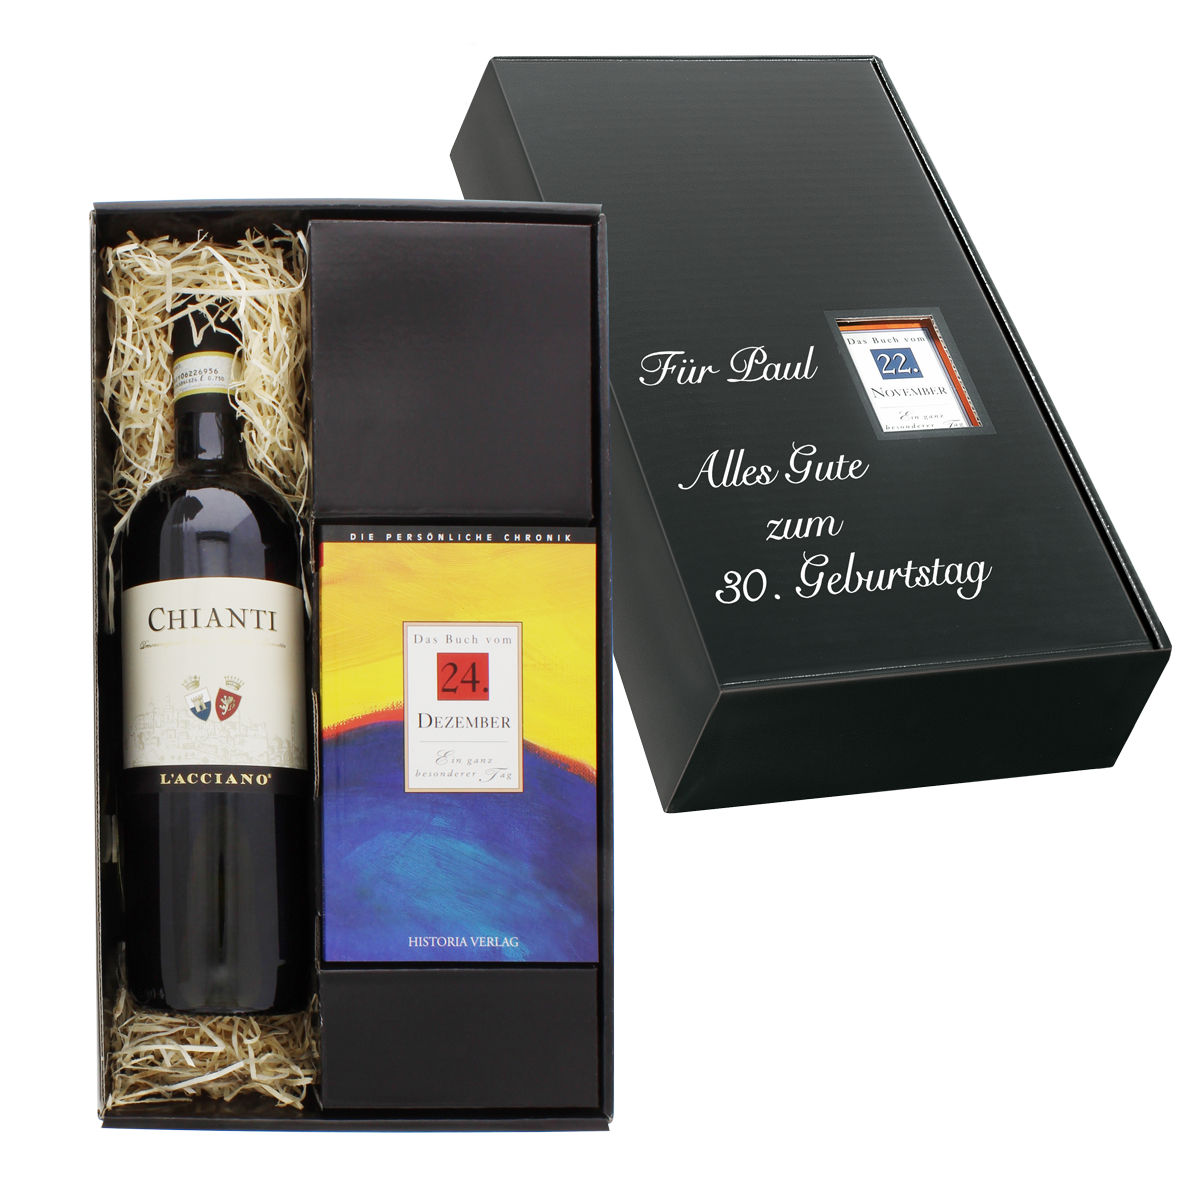 Italien-Set: Tageschronik vom 12. Januar & Chianti-Wein